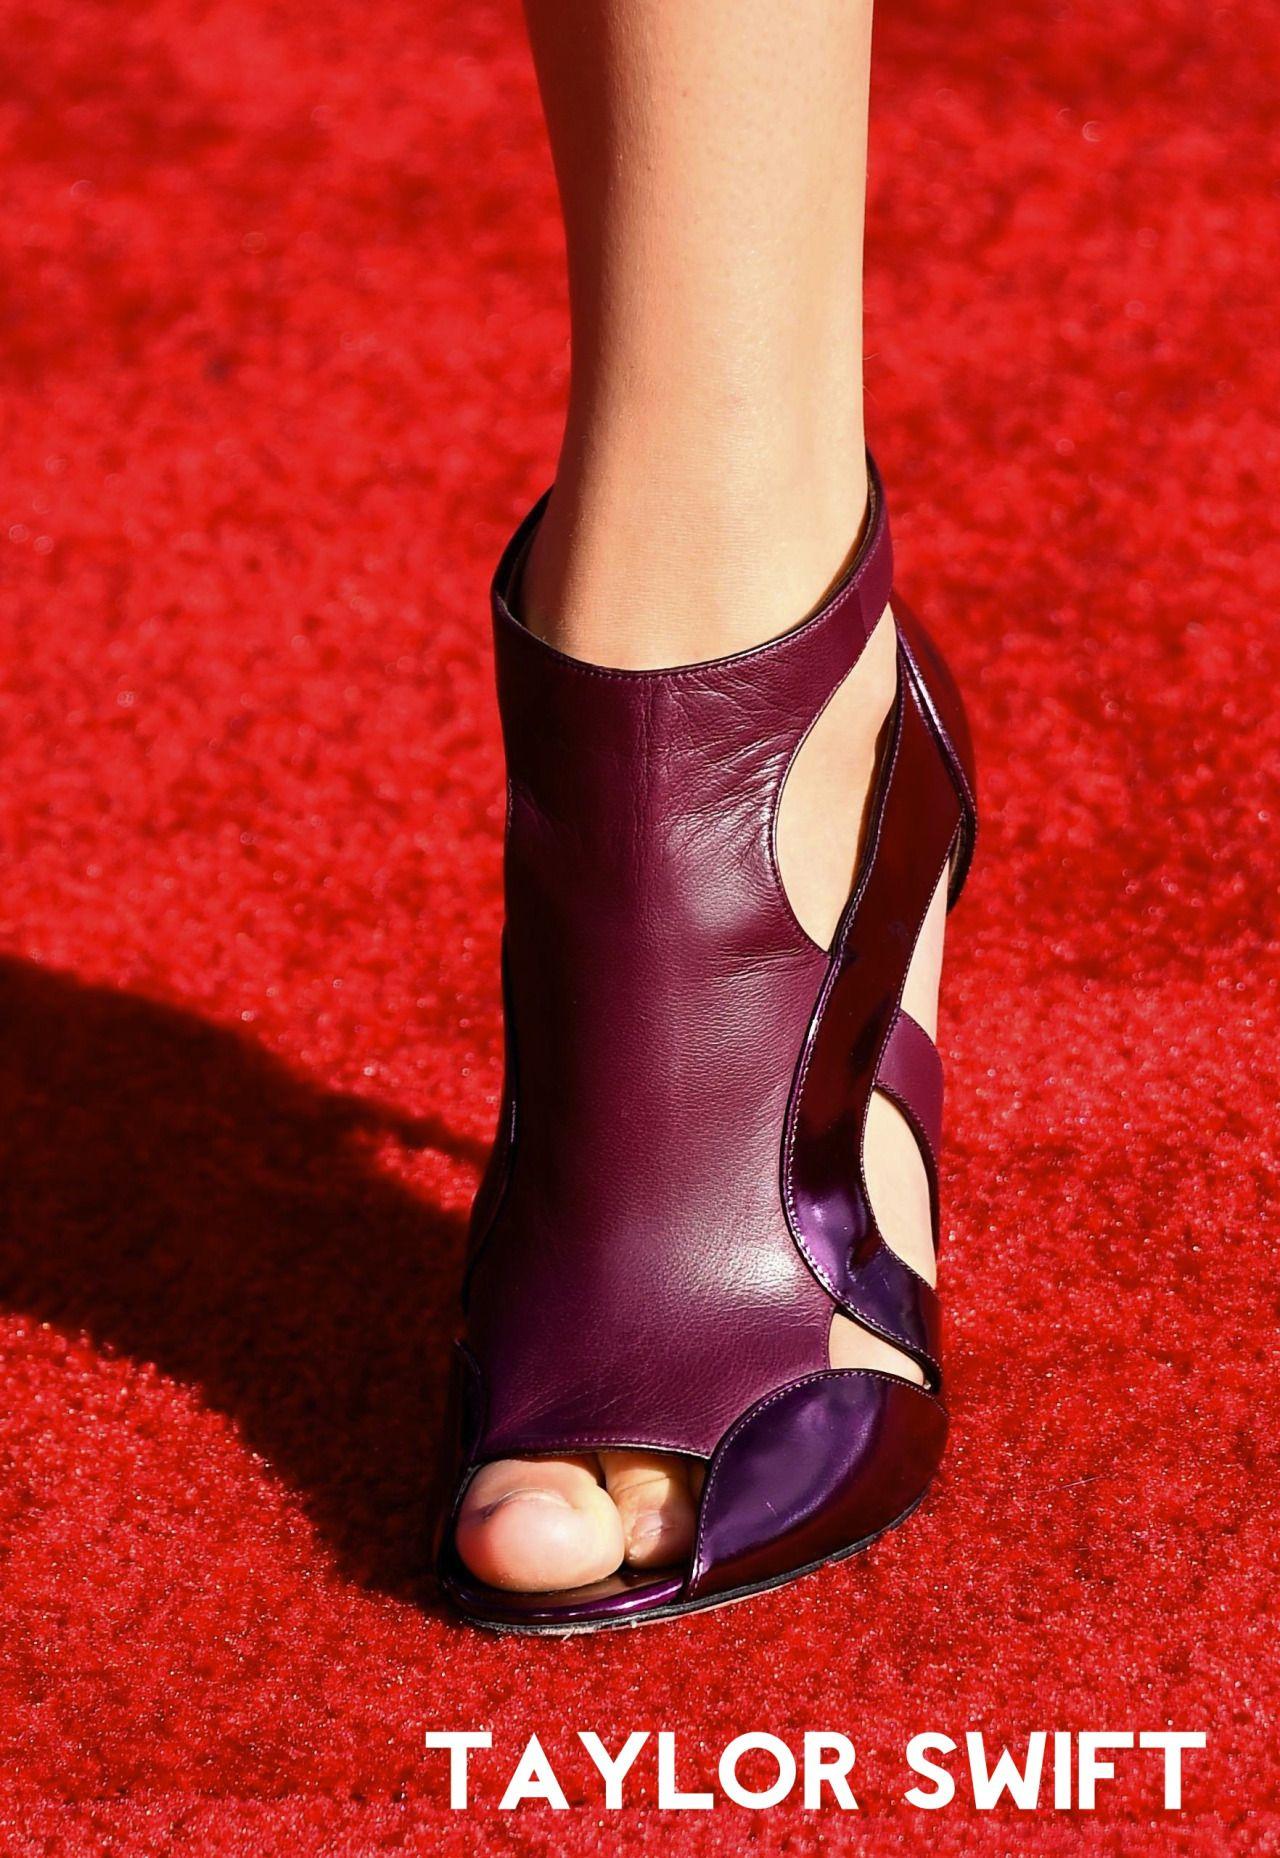 World Sexiest Feet Swagga 4 Amber Taylor